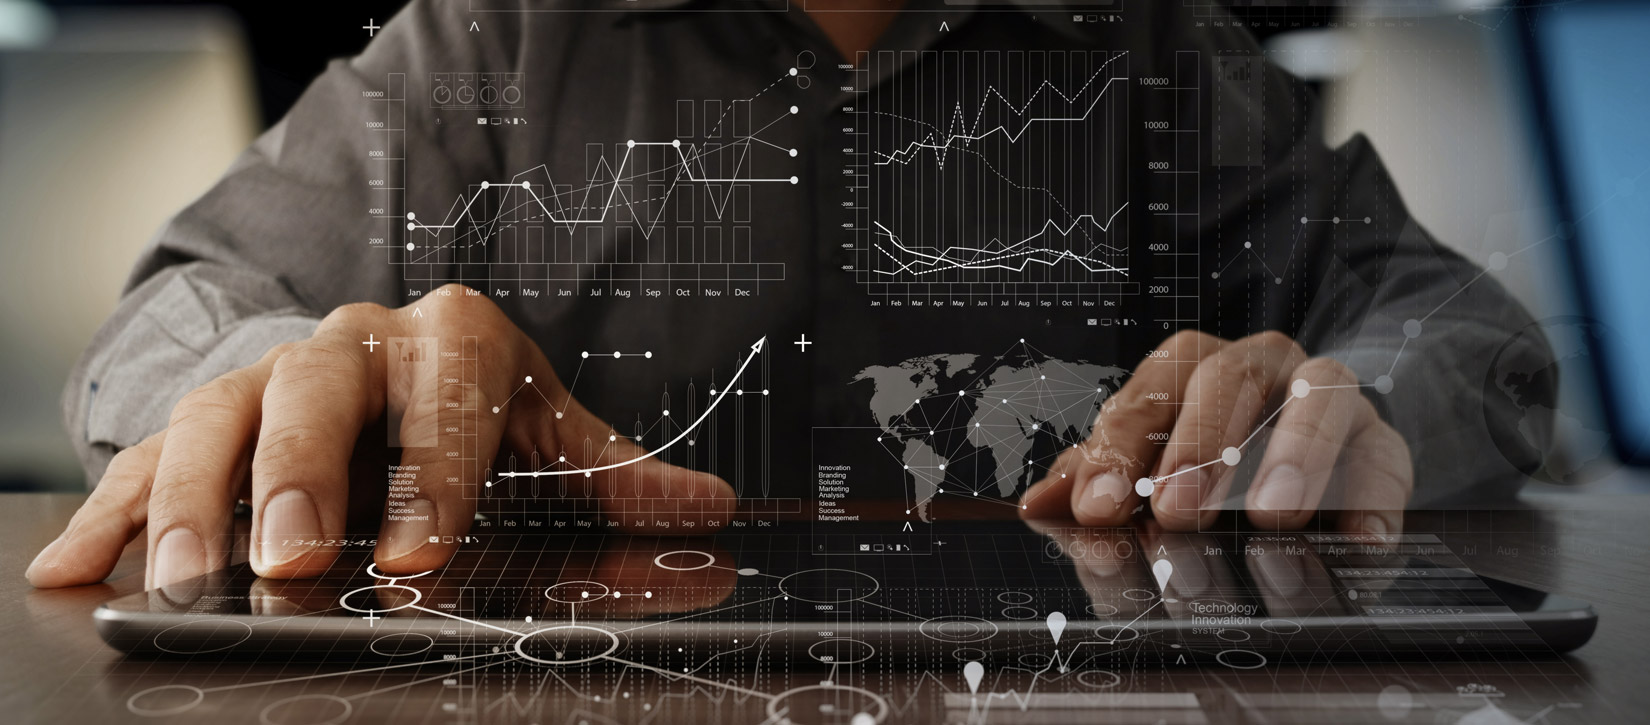 Digital Evaluation and Monitoring Training